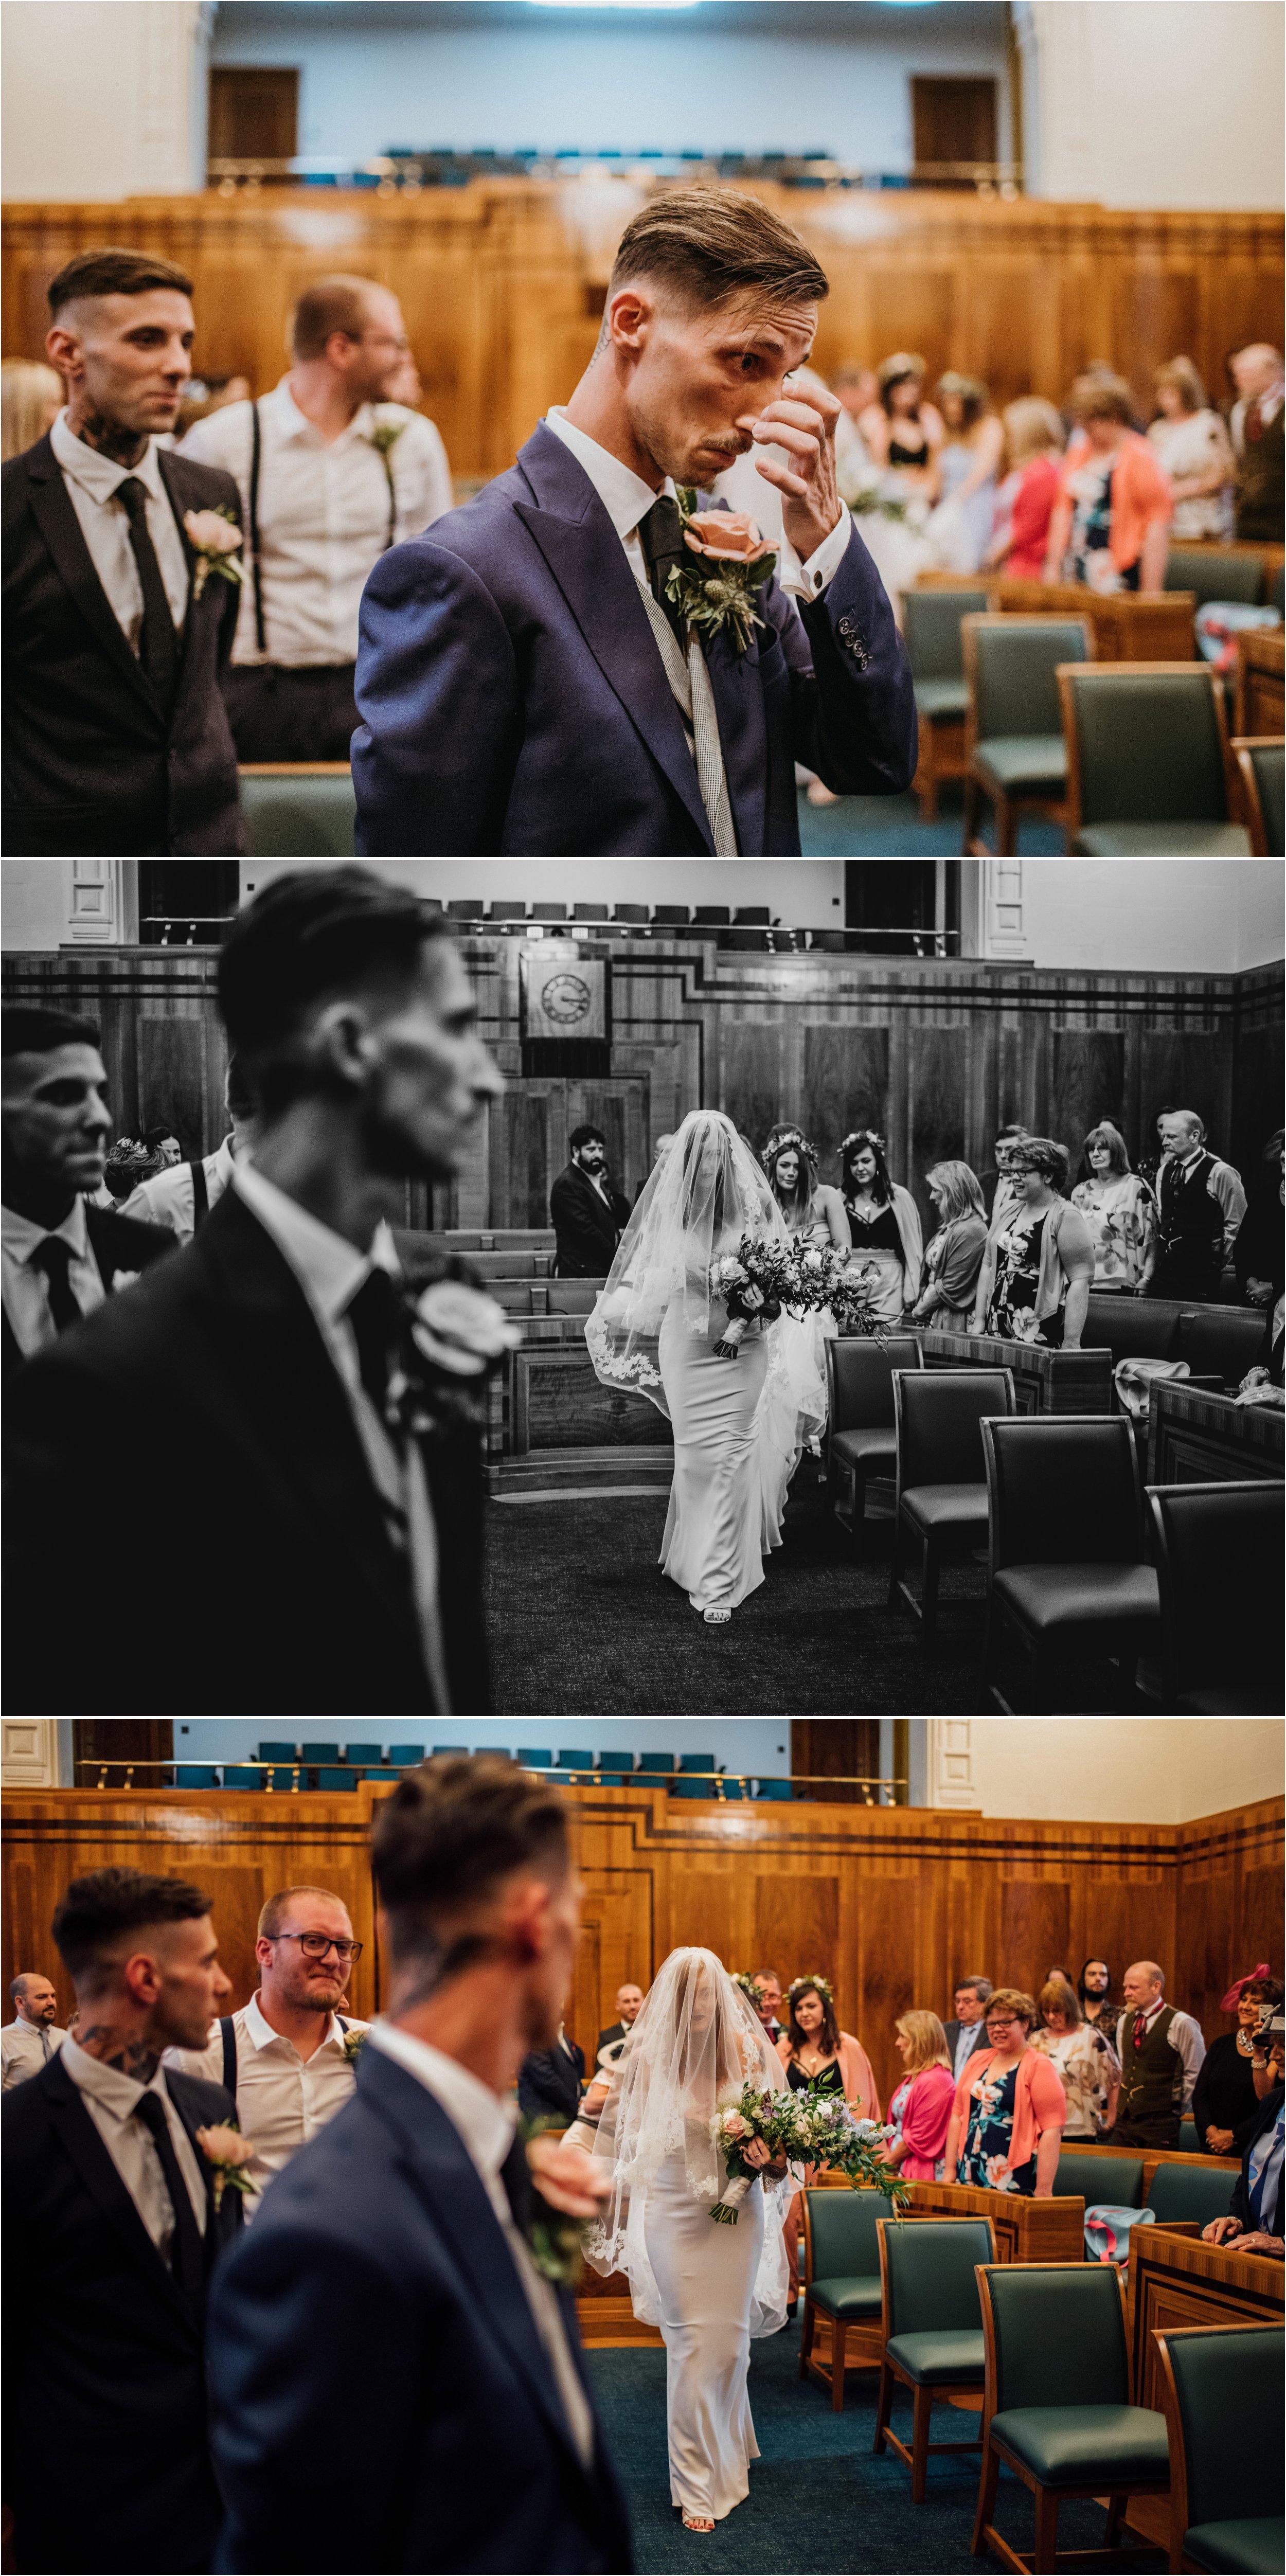 Hackney town hall wedding photography_0053.jpg